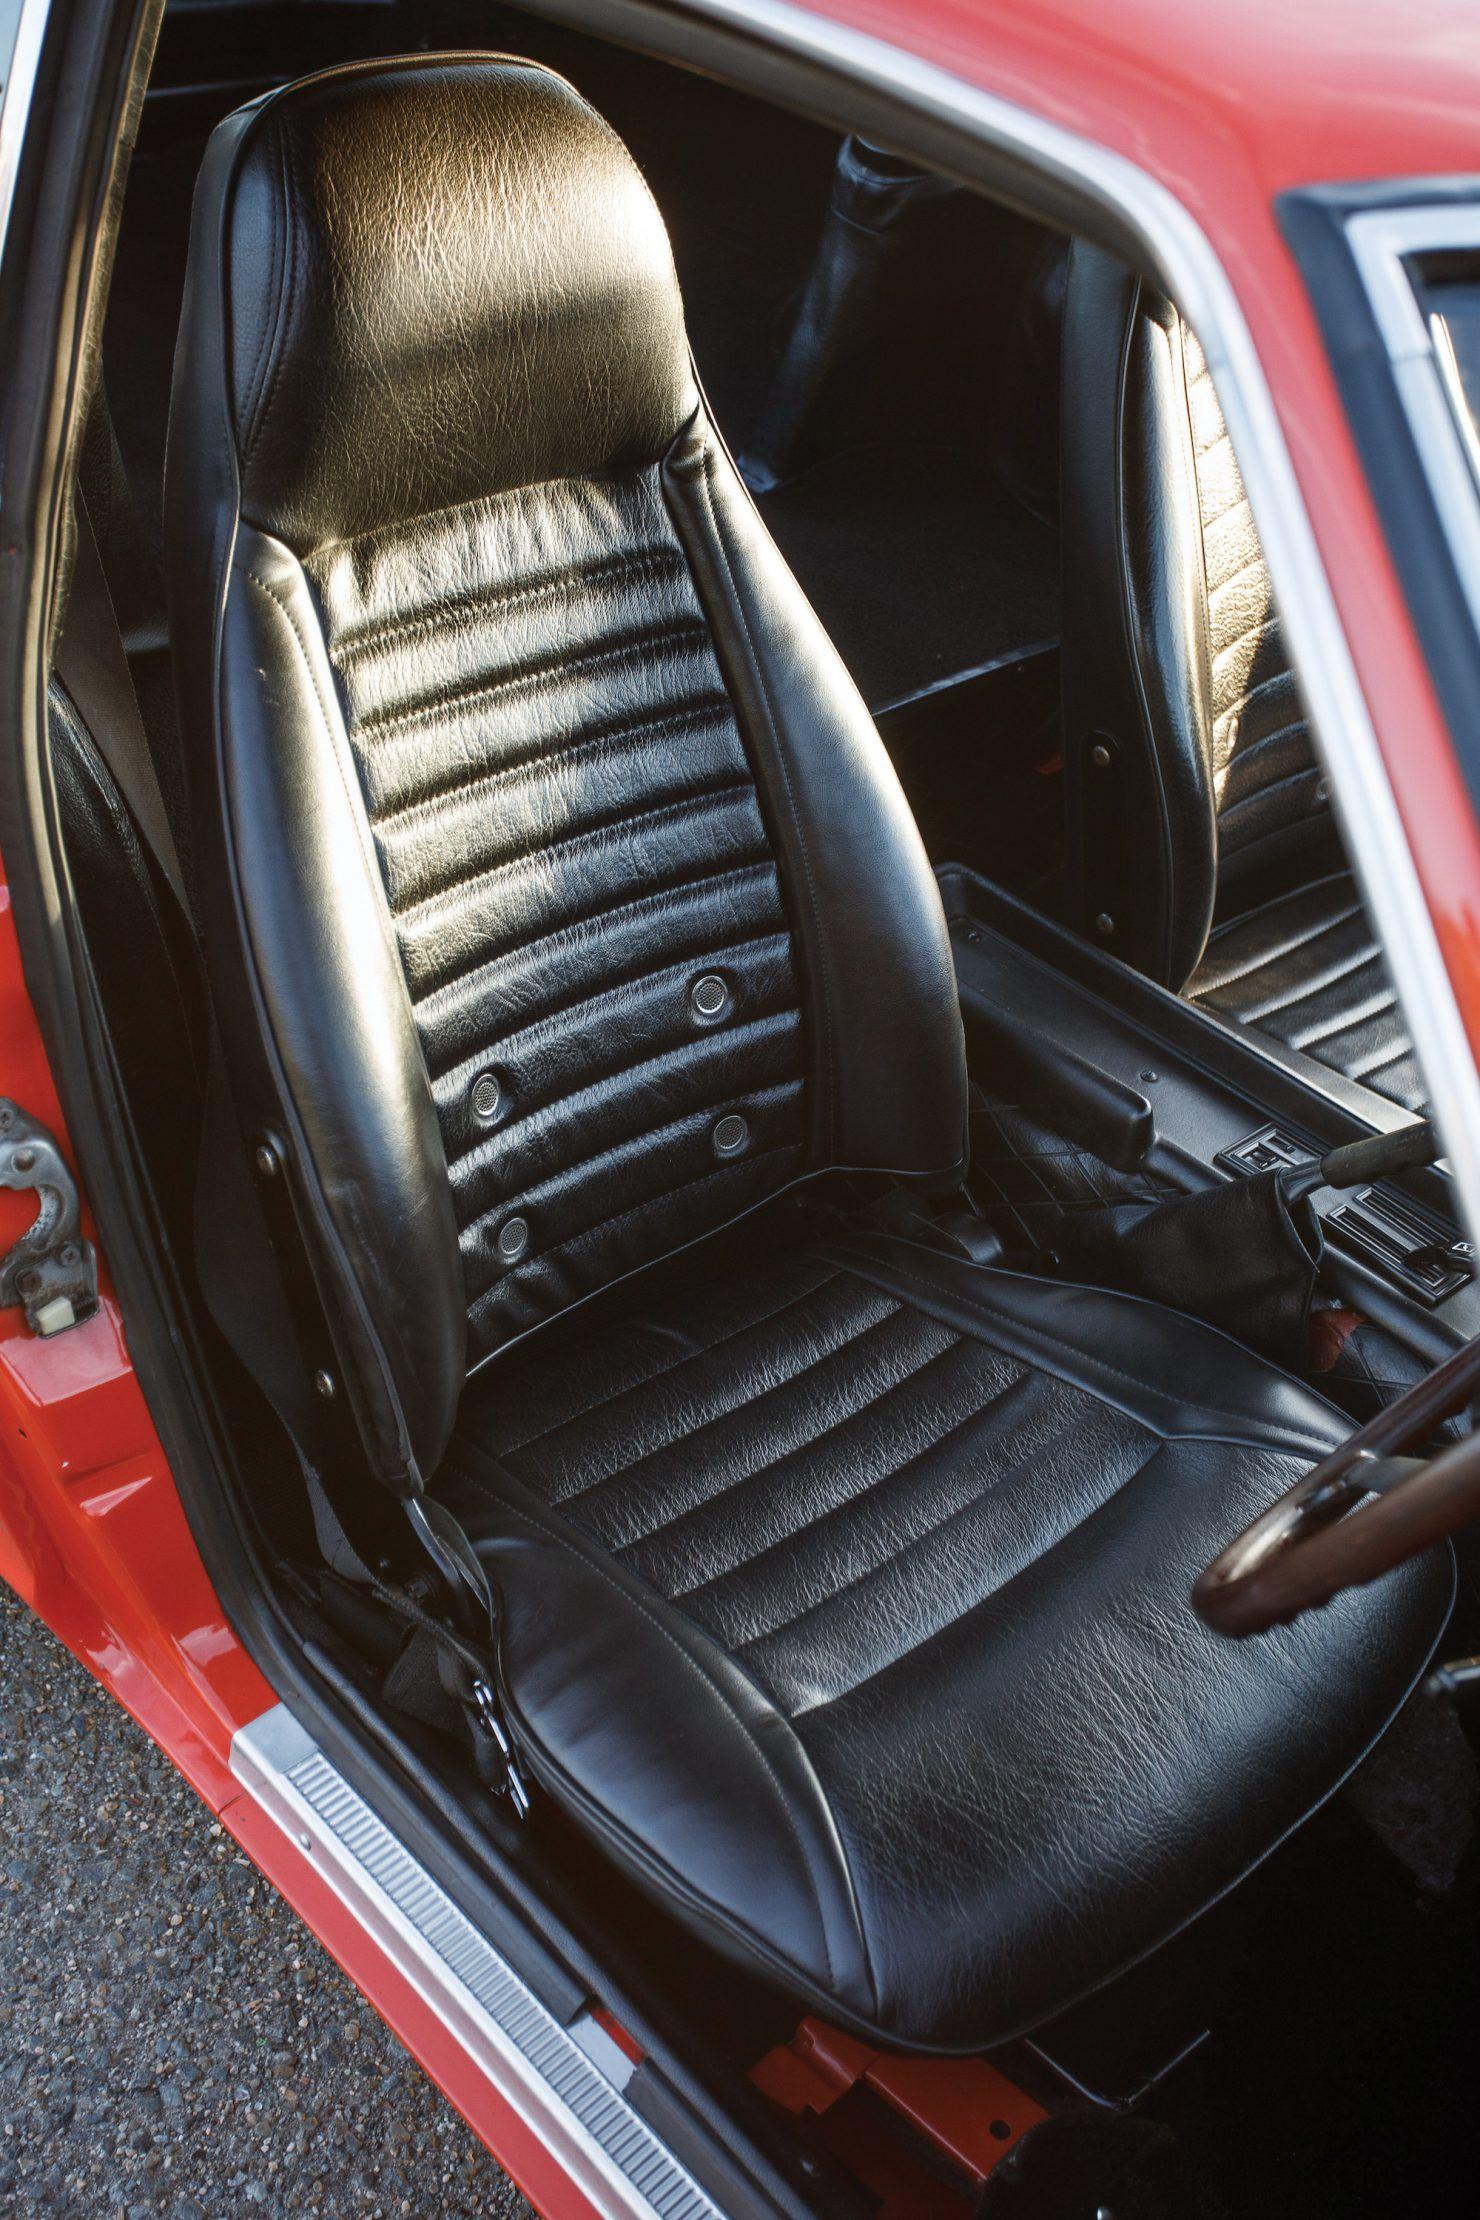 Nissan Fairlady Z 432 Datsun 240z Nissan Z Cars Nissan